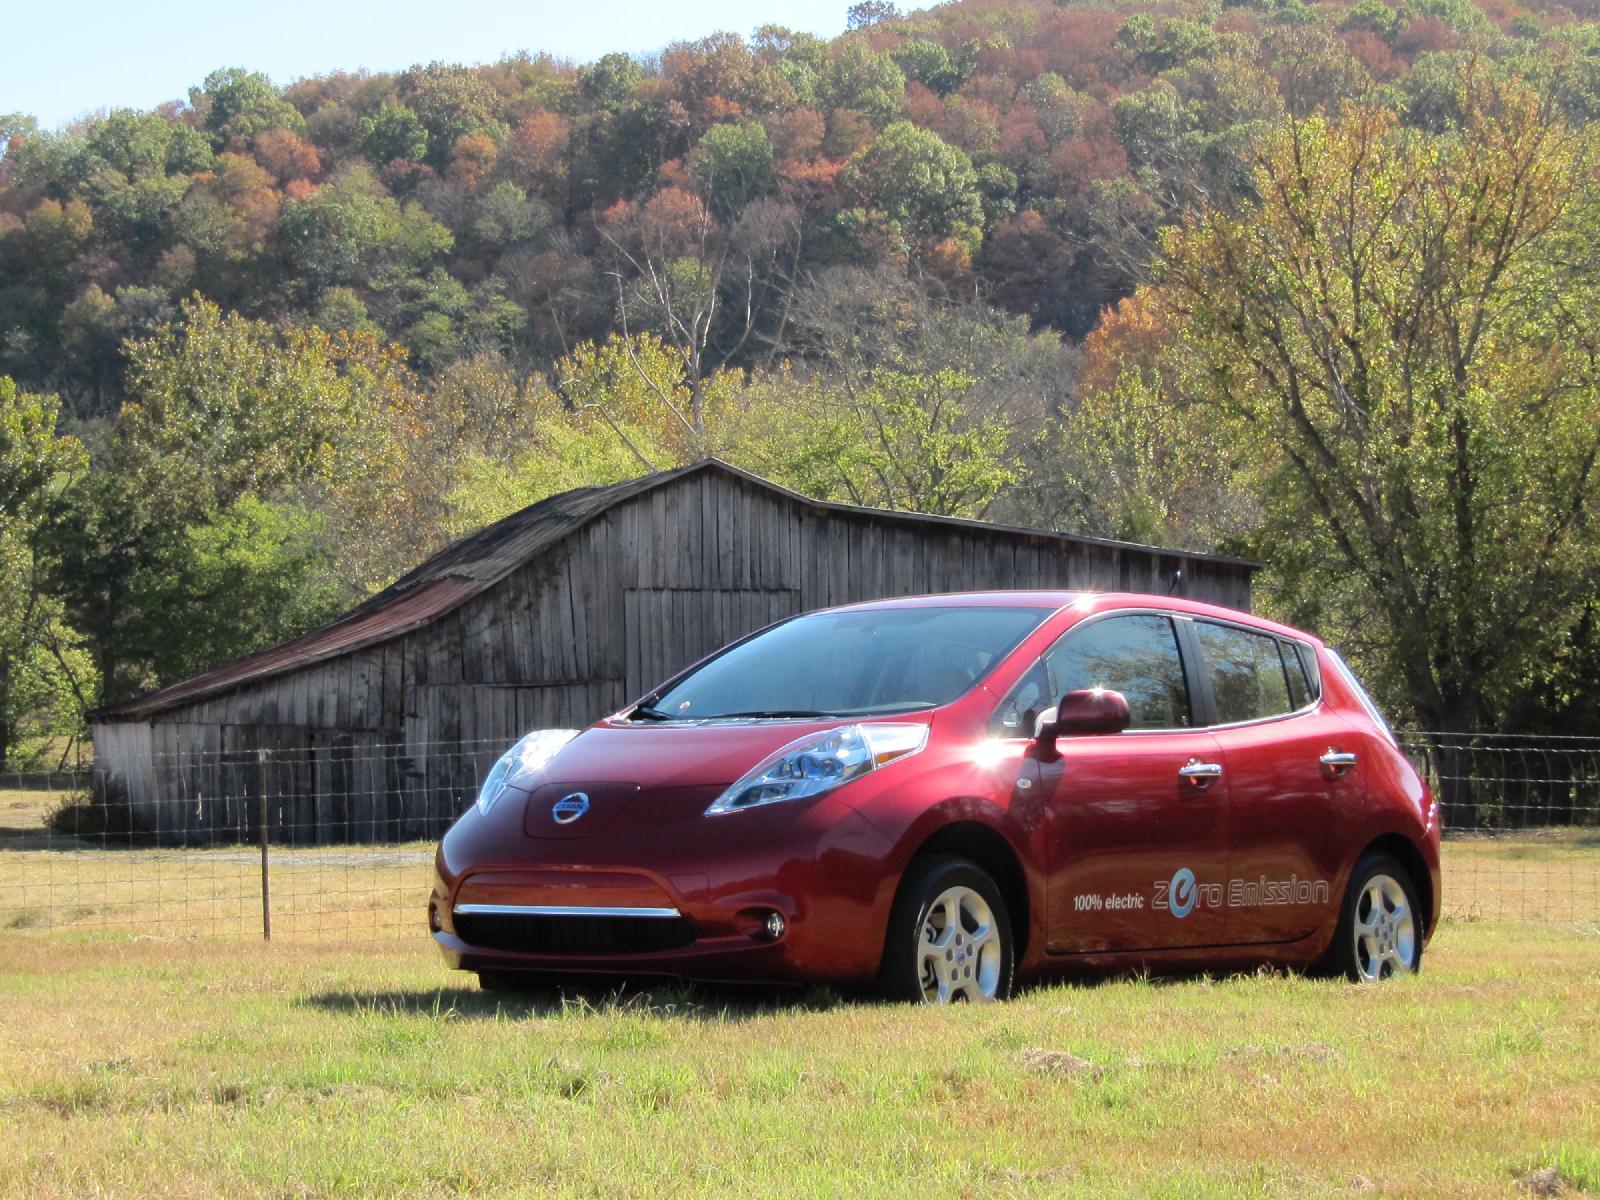 2019 Nissan Leaf Plus vs  2011 Nissan Leaf: 5 takeaways over